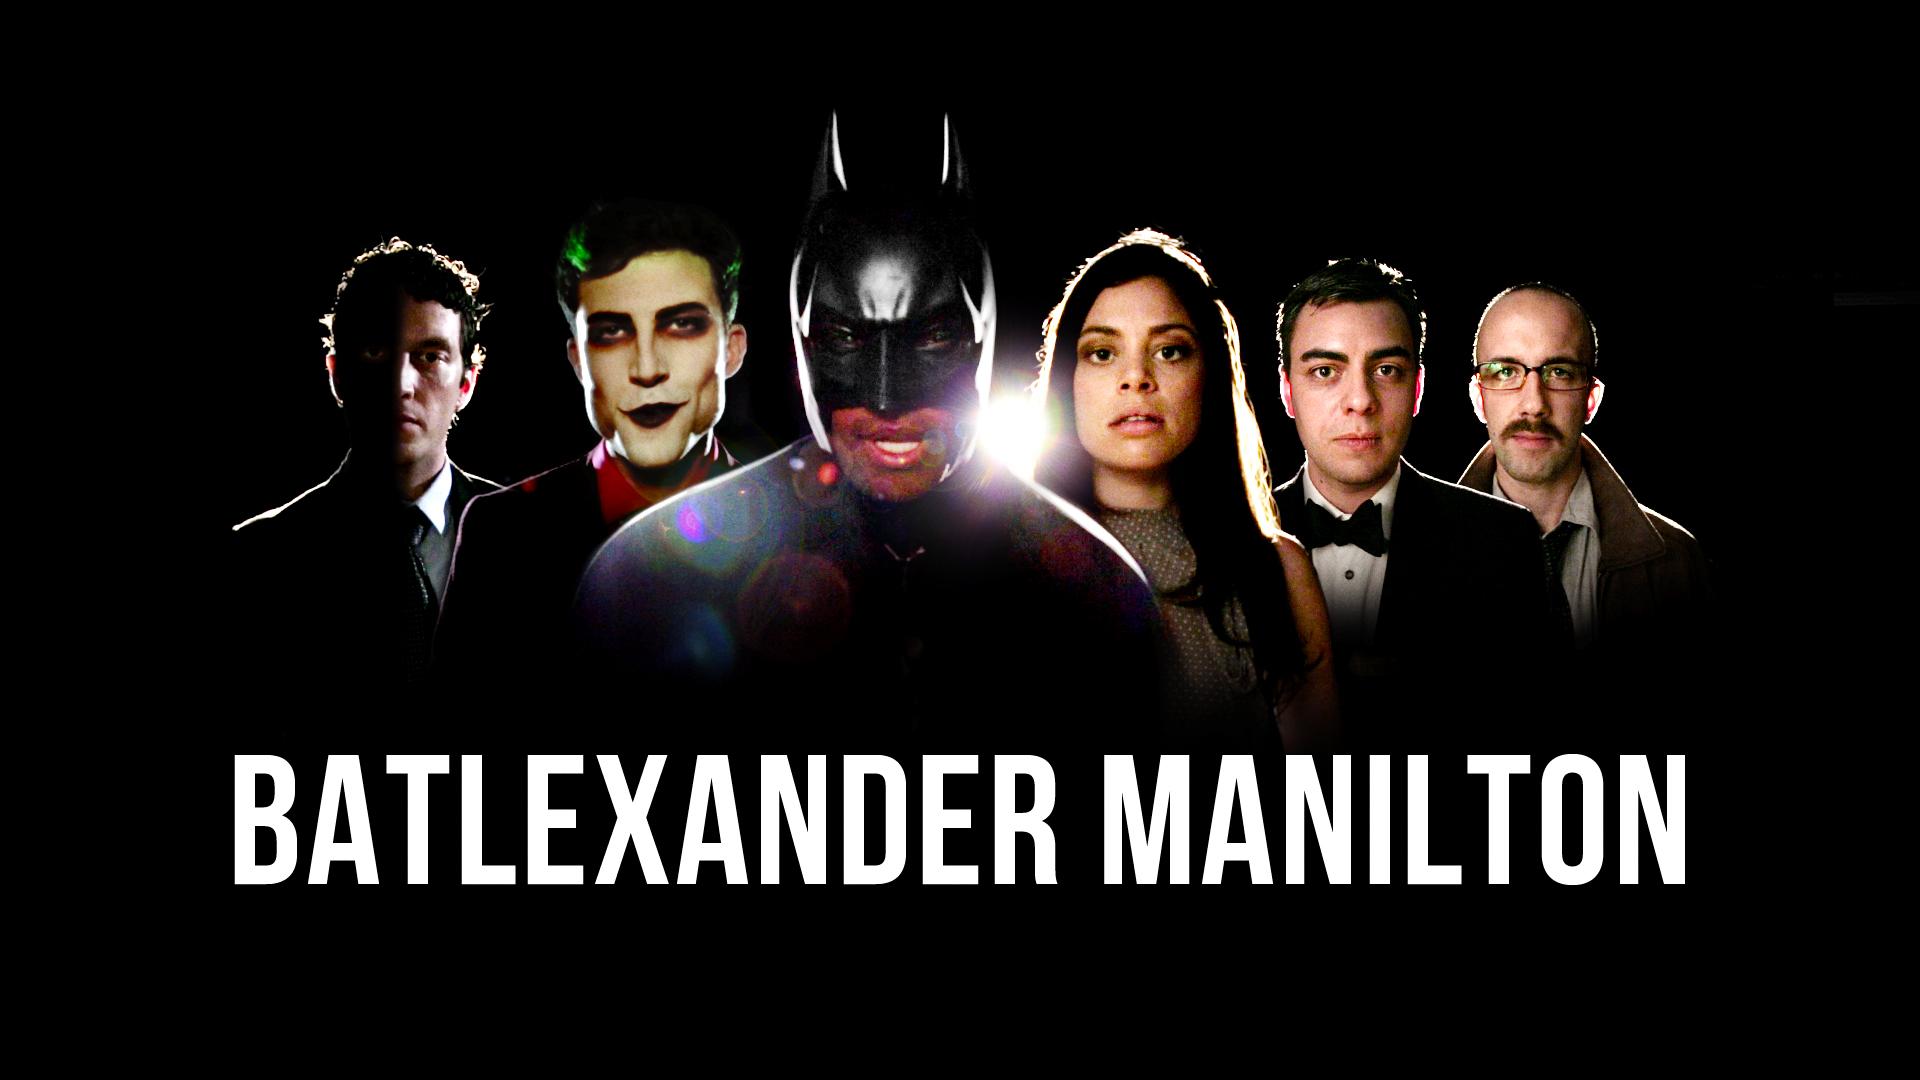 Batlexander Manilton